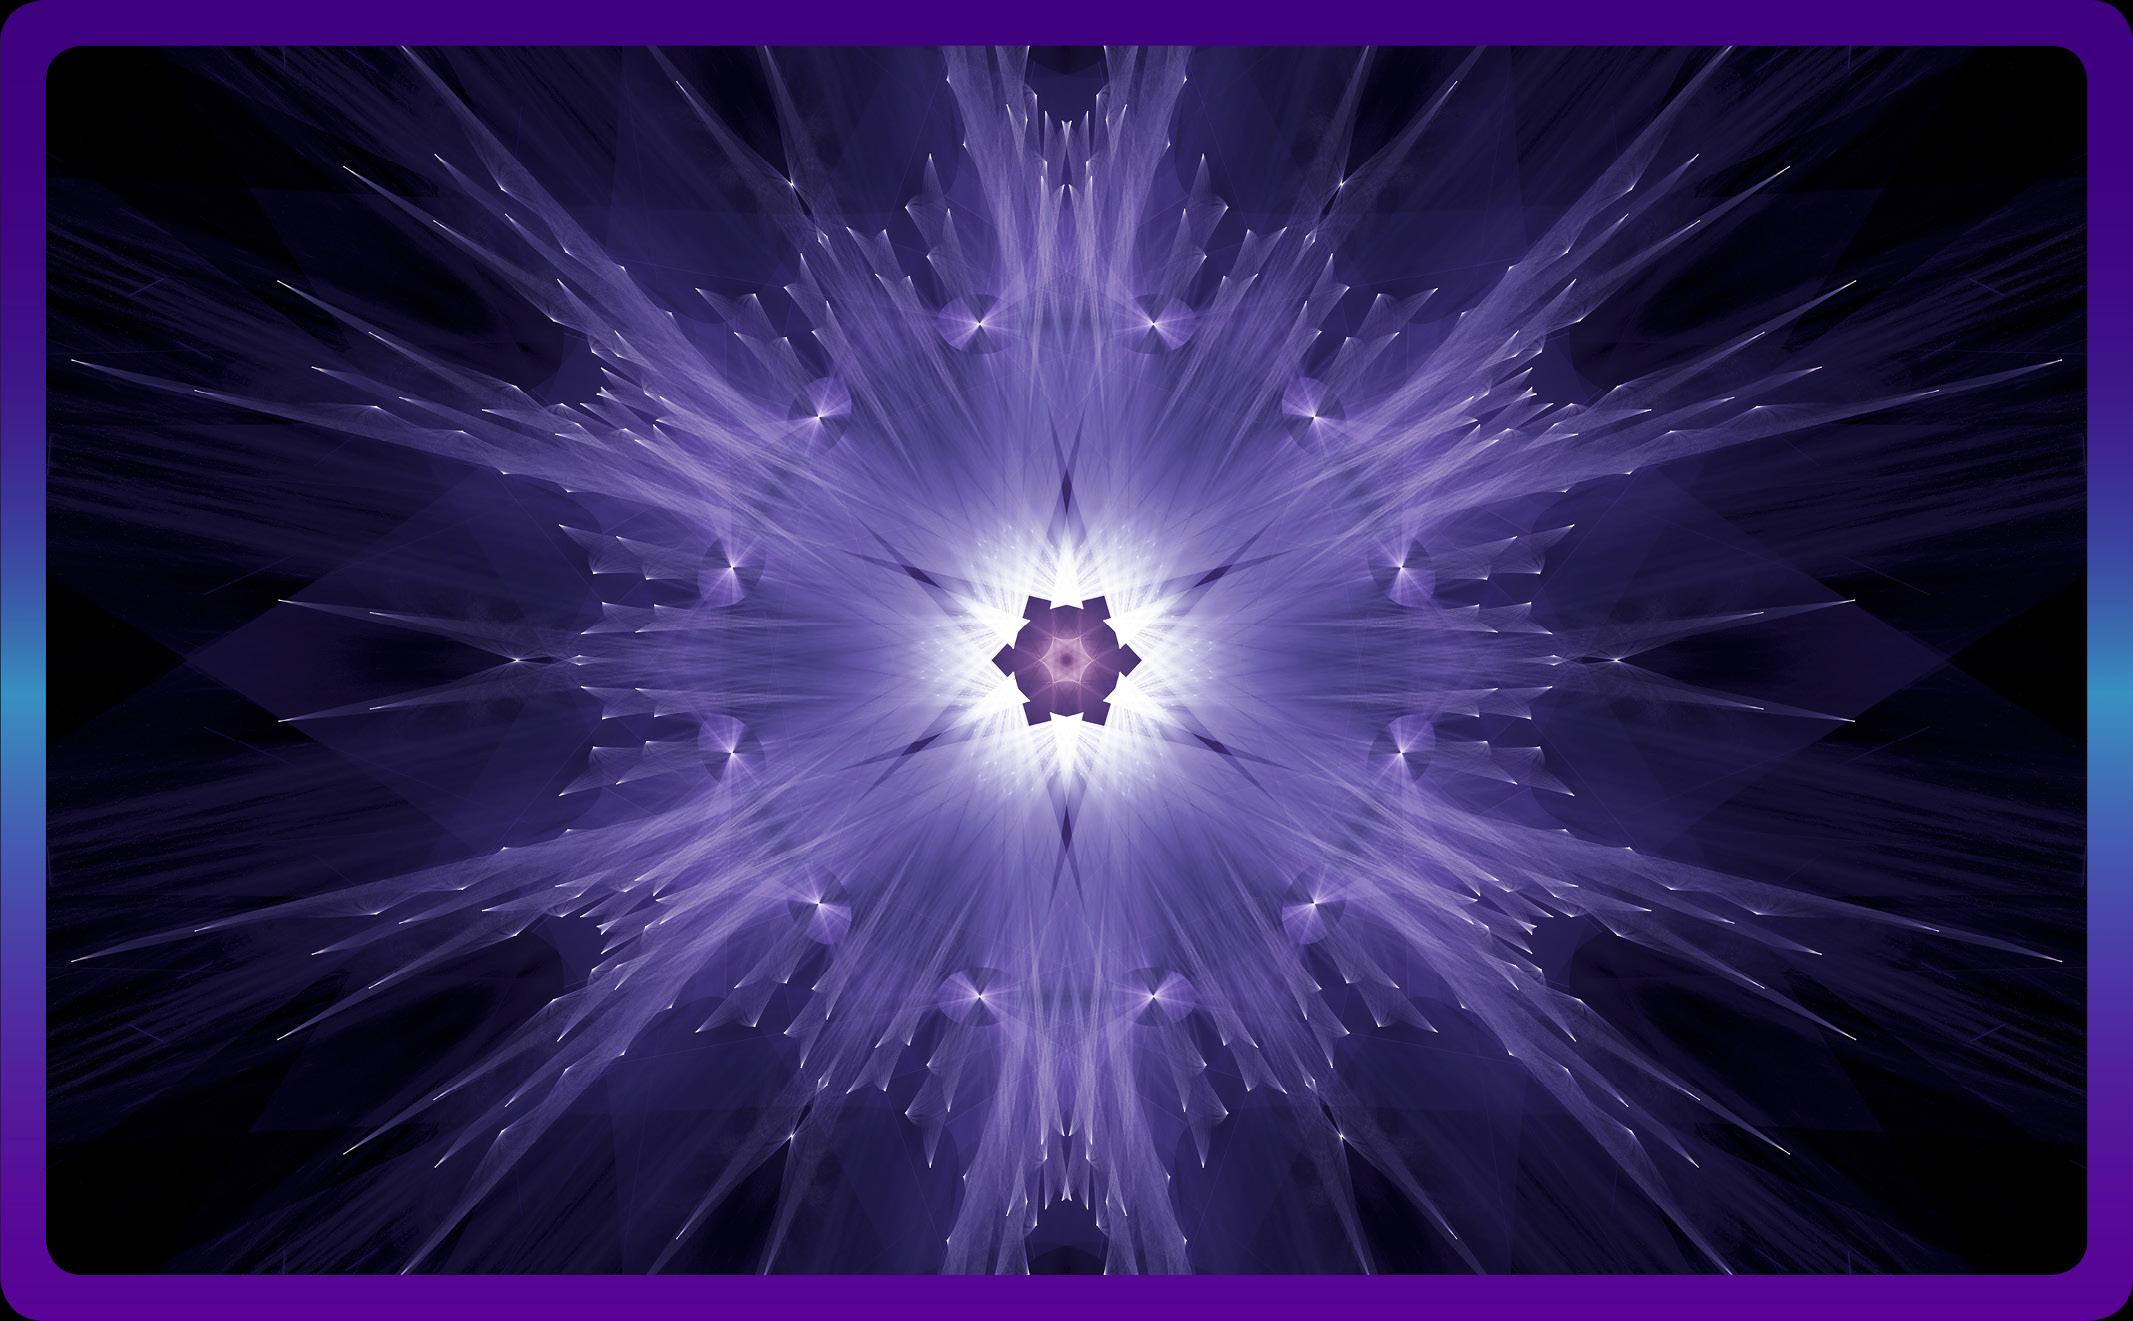 Harmony - Oracle Cards - Sacred Geometry - Main Horizontal Image